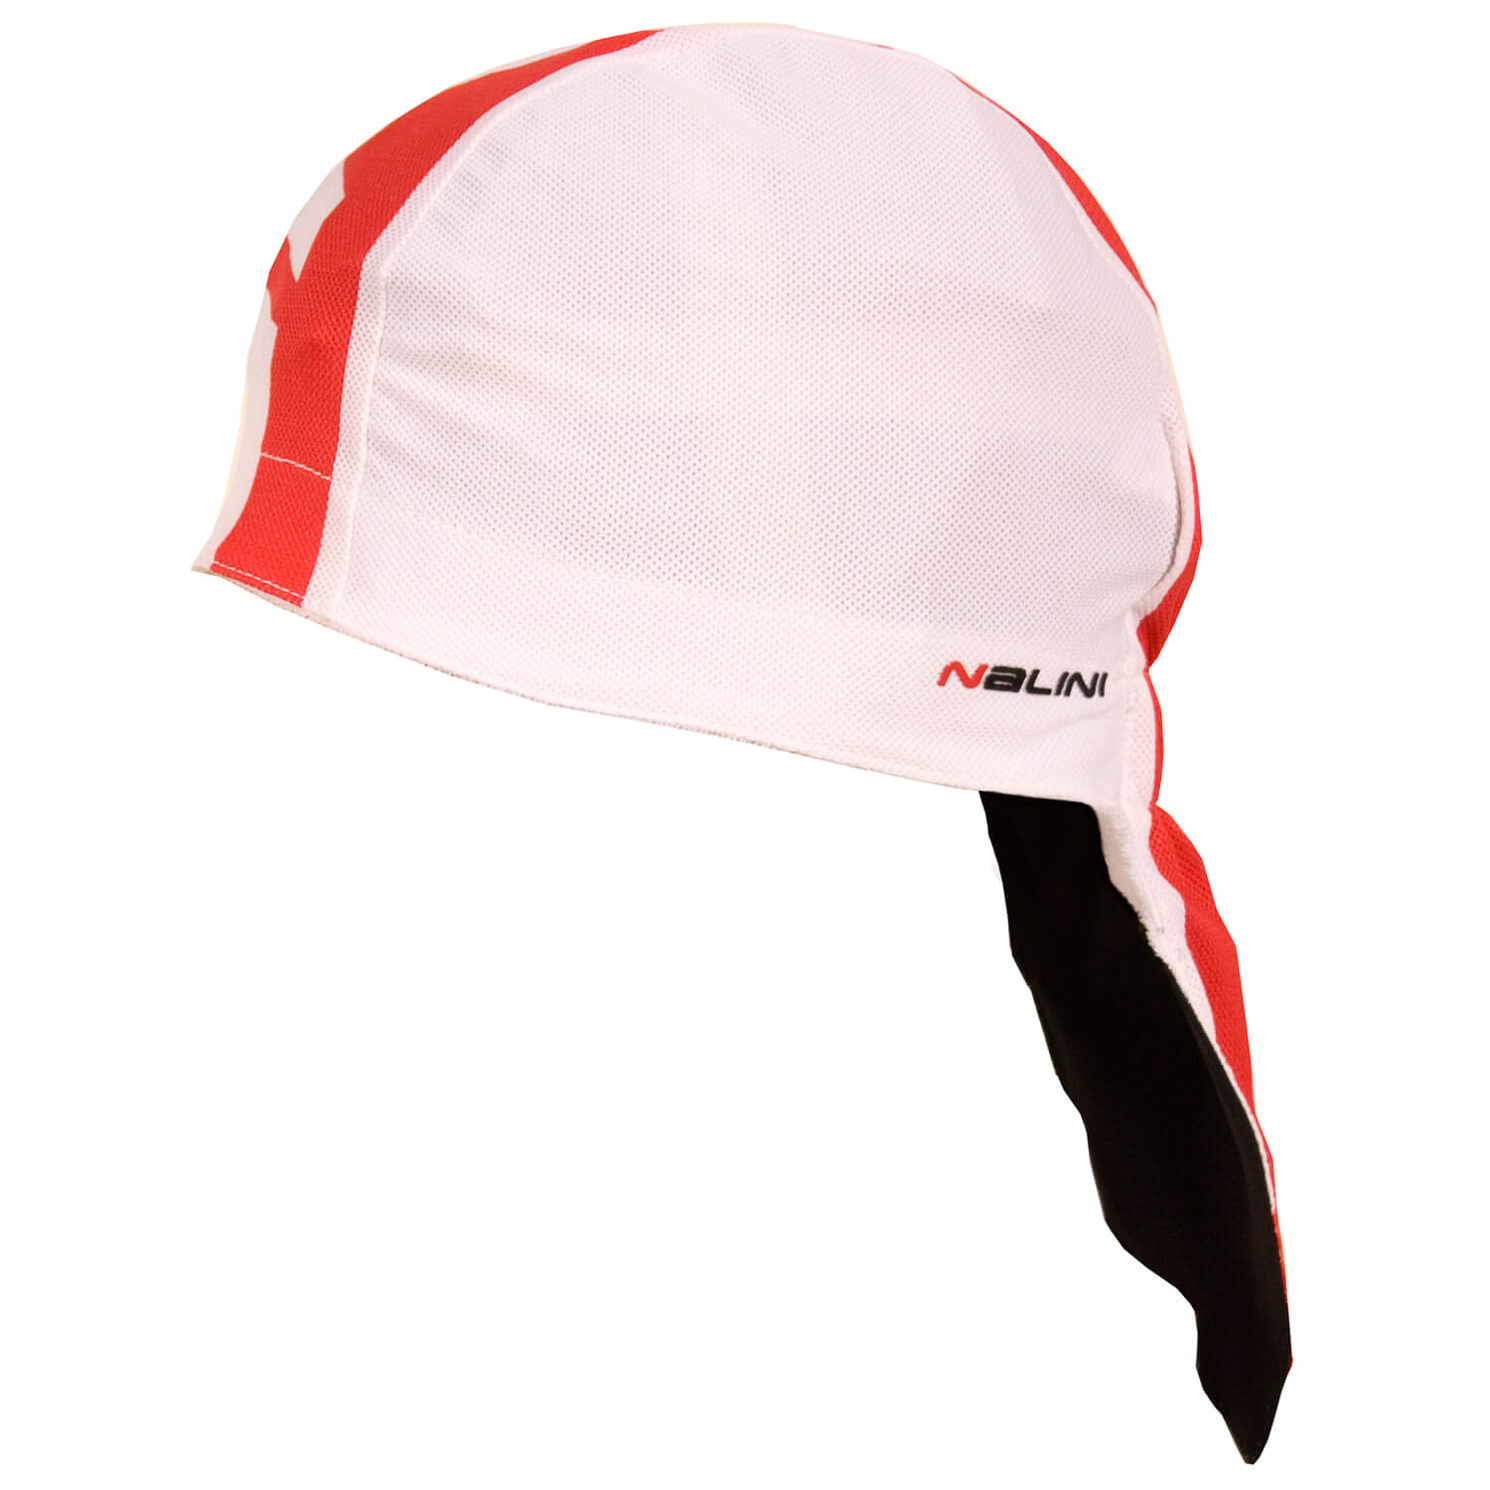 Nalini Red Bandana Cycling Cap Buy Online Alpinetrek